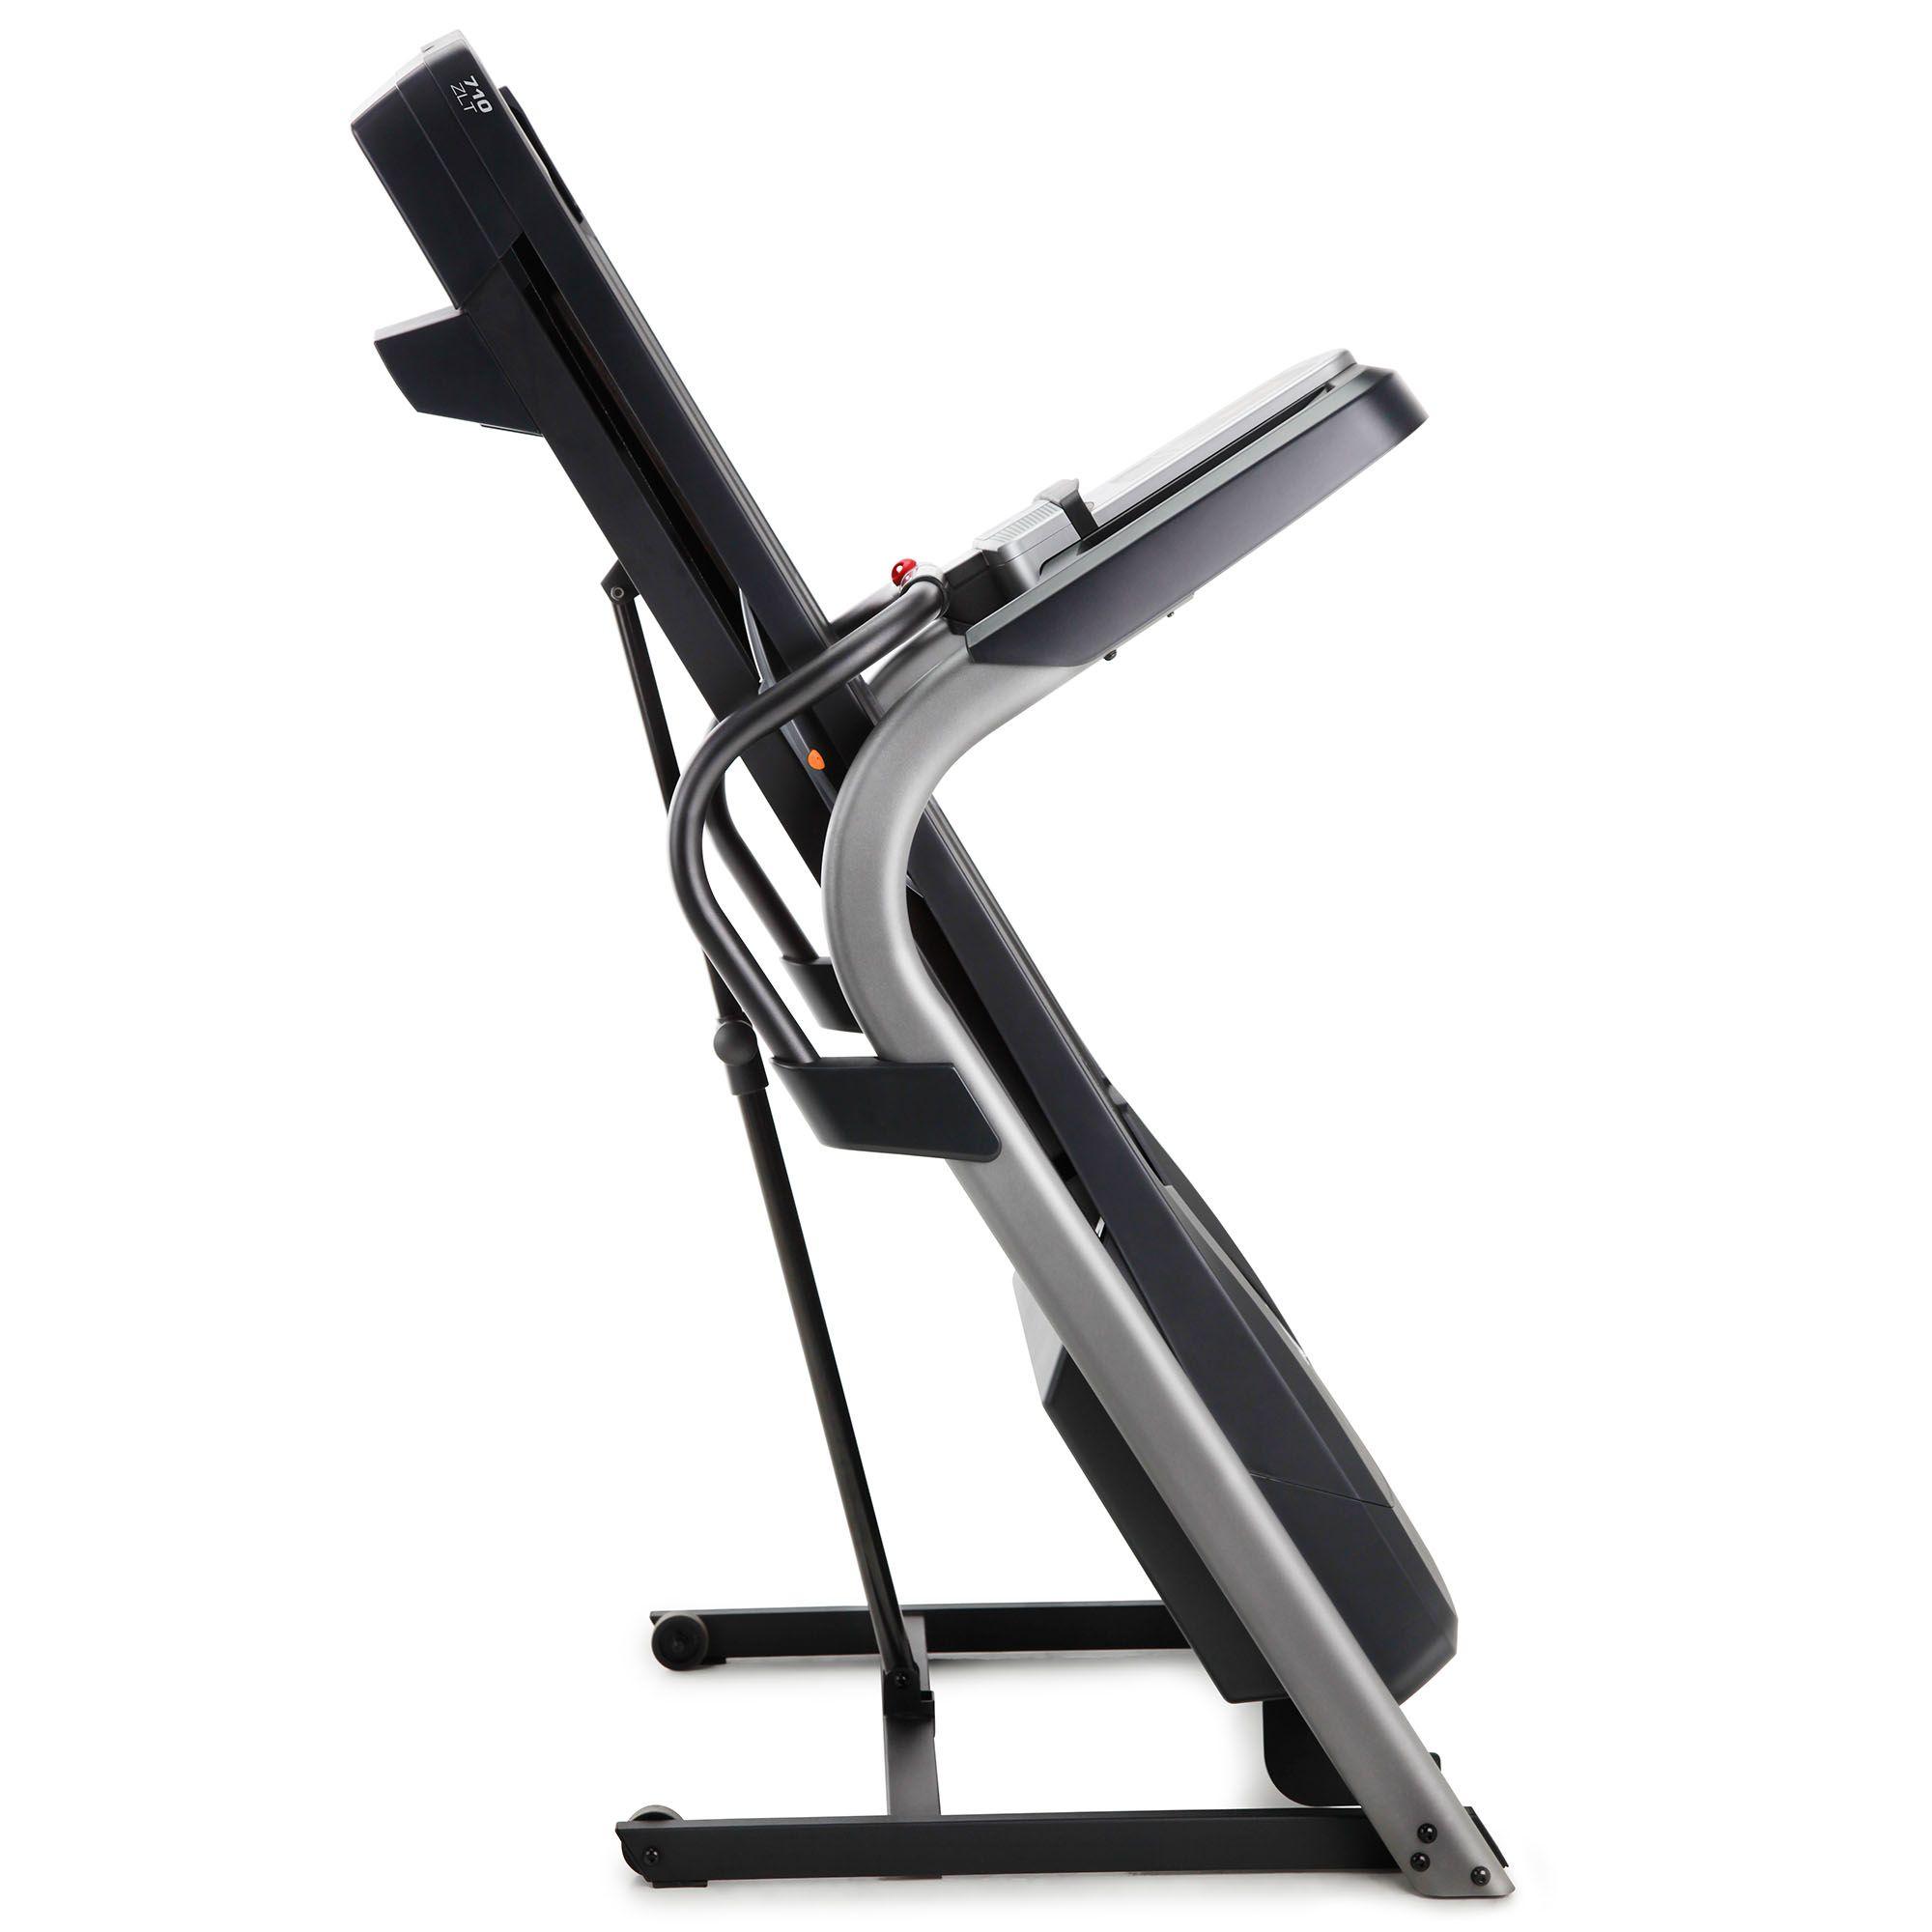 proform 5.0 zlt treadmill review